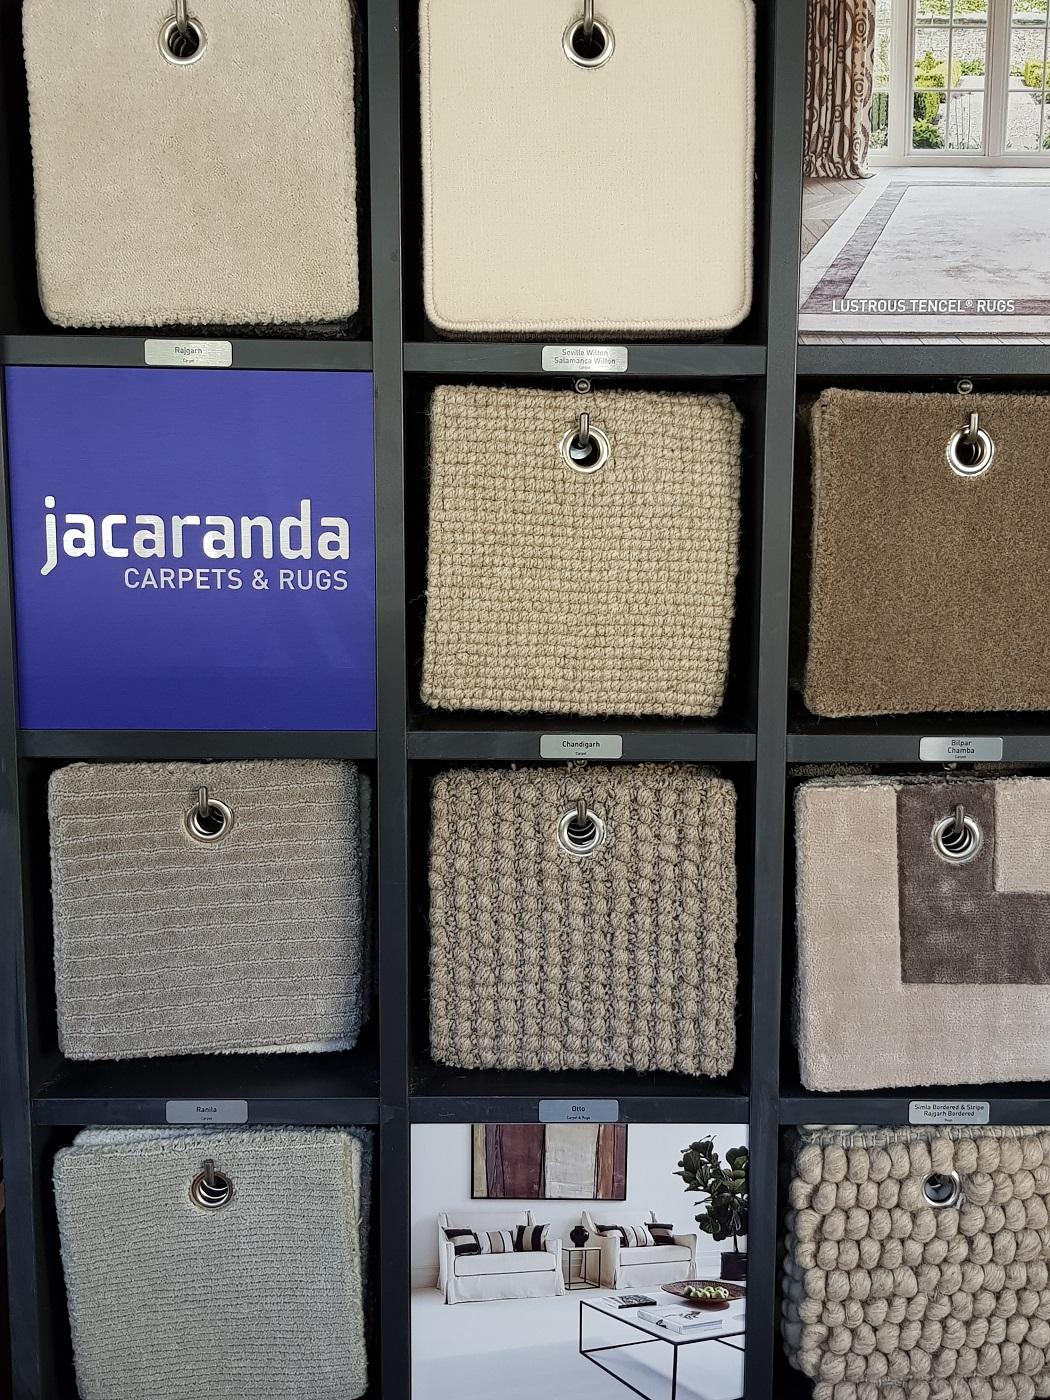 Jacaranda stand 1